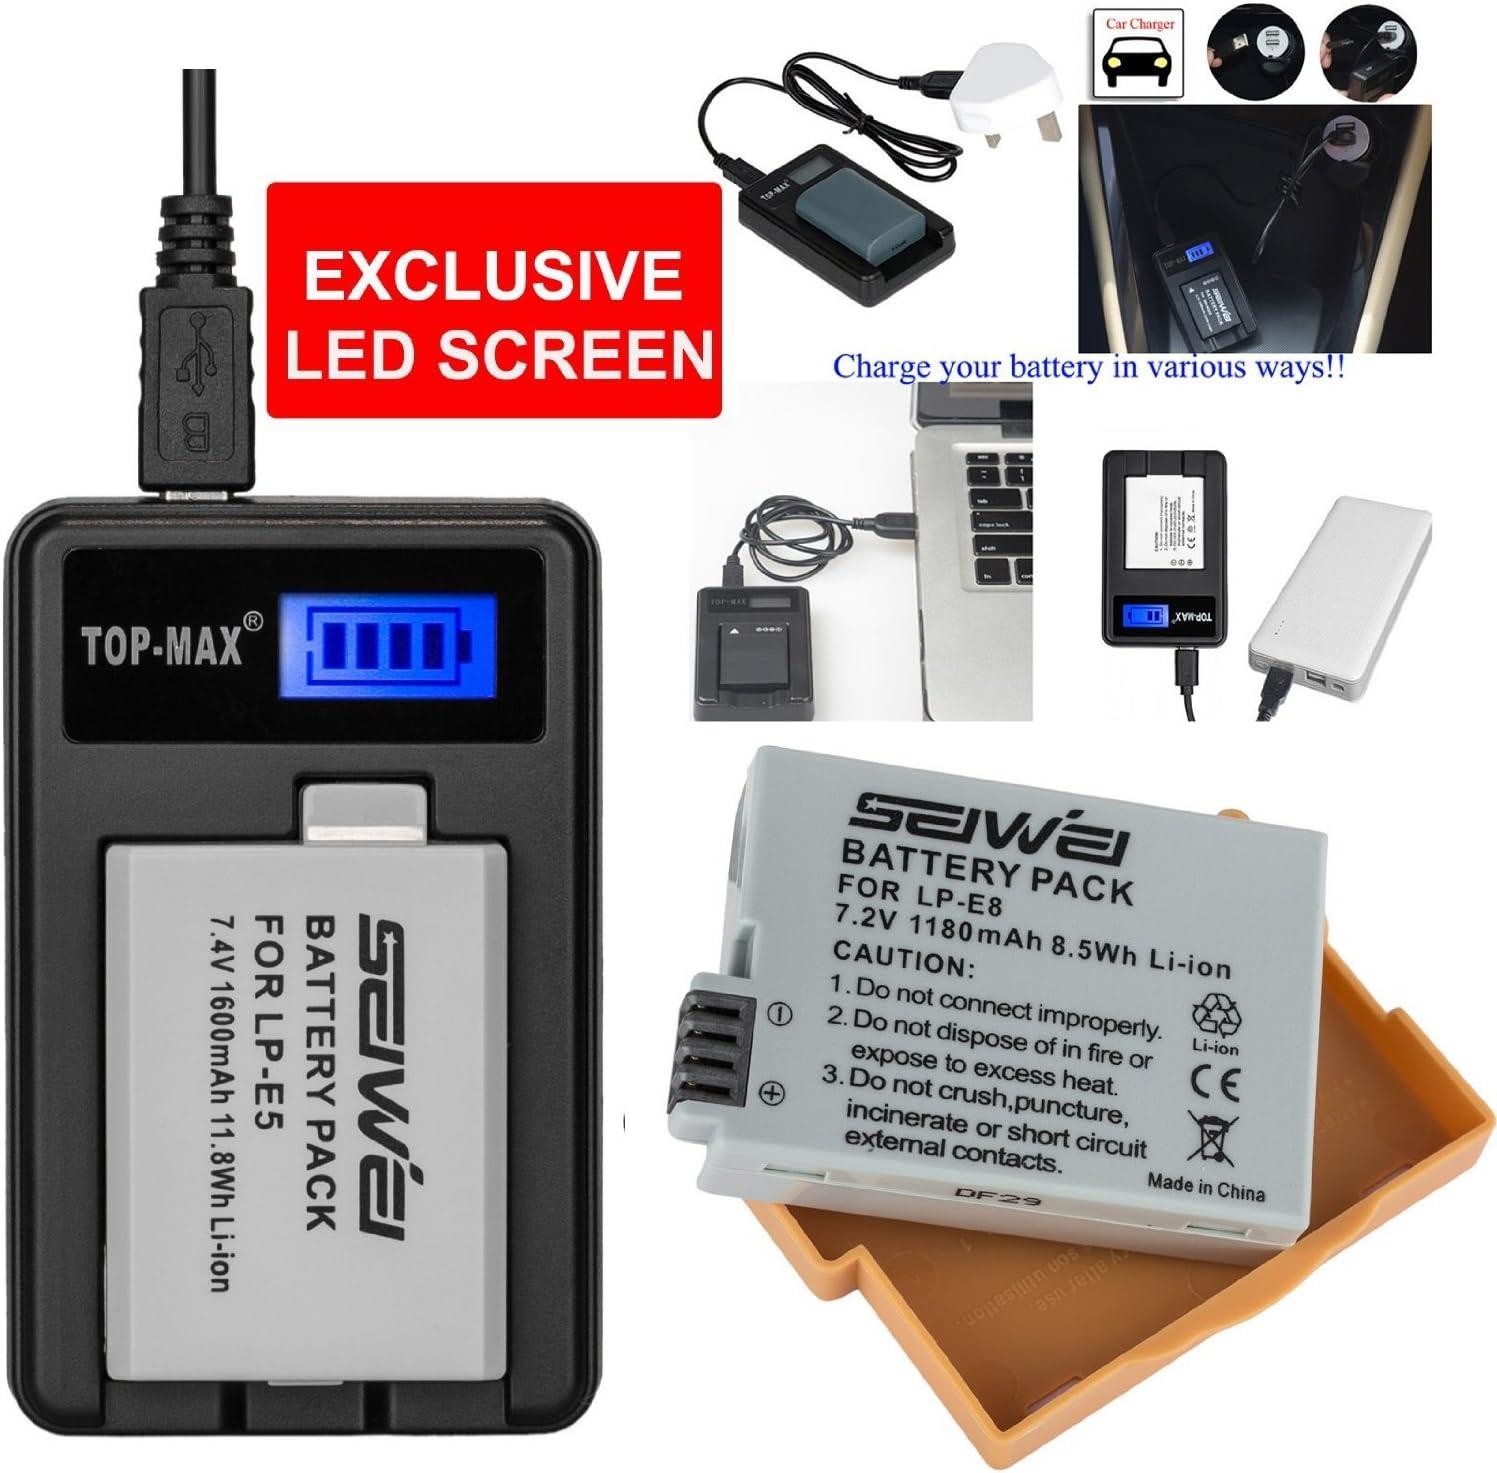 Top de Max? 3 x 4 x cámara battrie batería 1180 mAh 7.2 V para Canon LP-E8 LPE8 EOS 550d 600d X4 X5 T2i T3i: Amazon.es: Electrónica